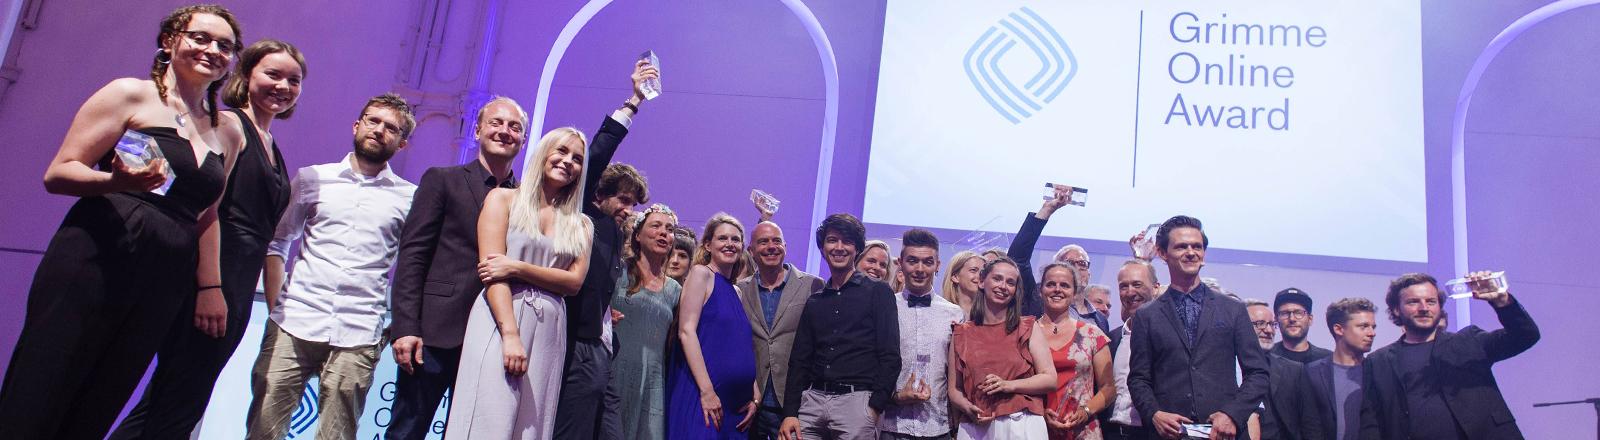 Der Grimme Online Award 2016